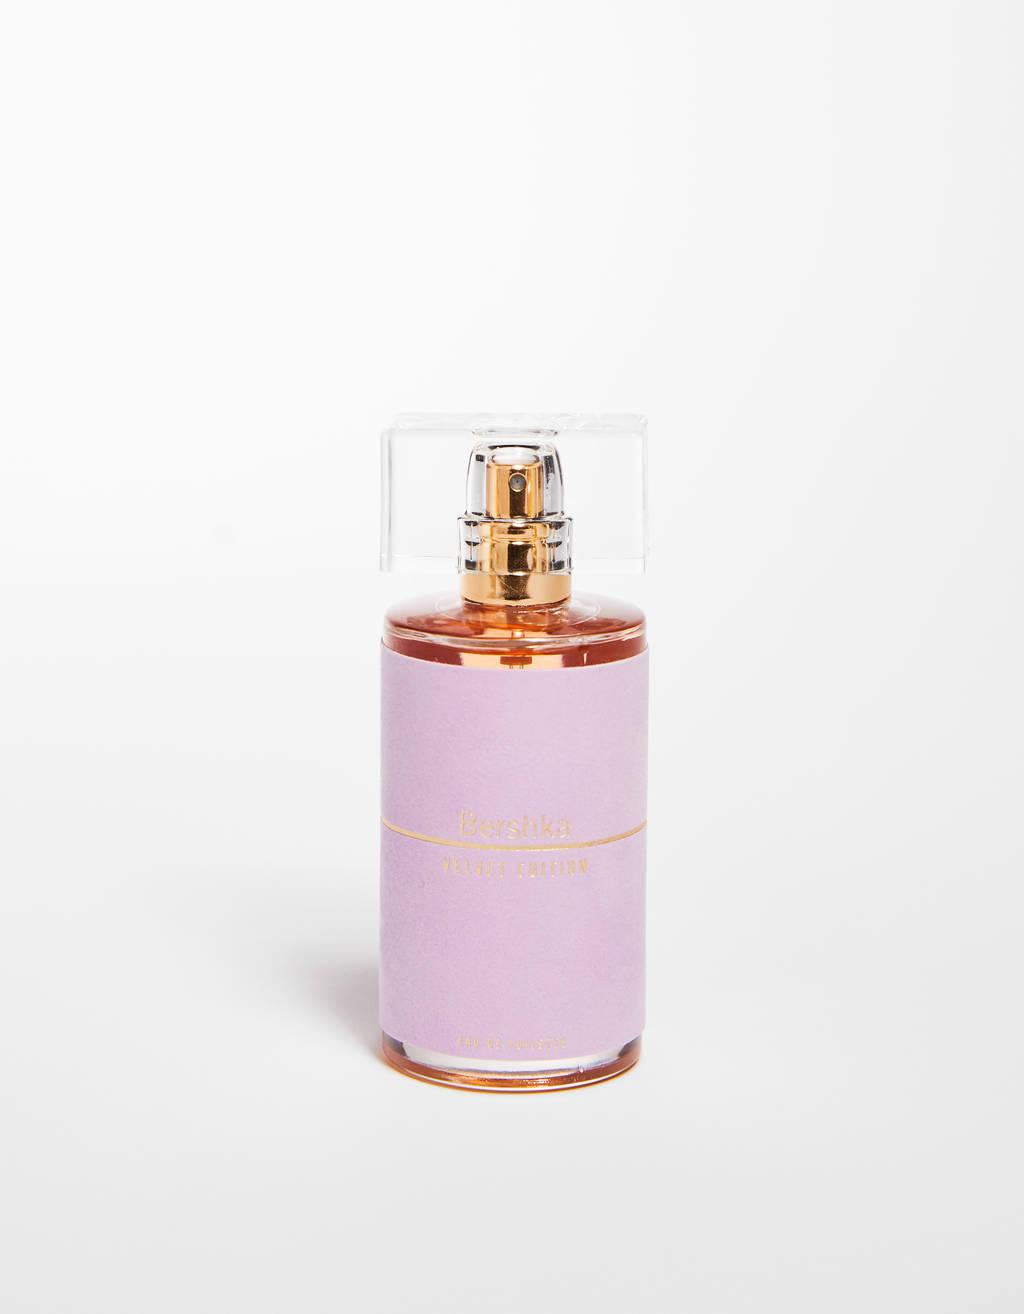 Bershka Velvet Edition Eau de Toilette 50 ml